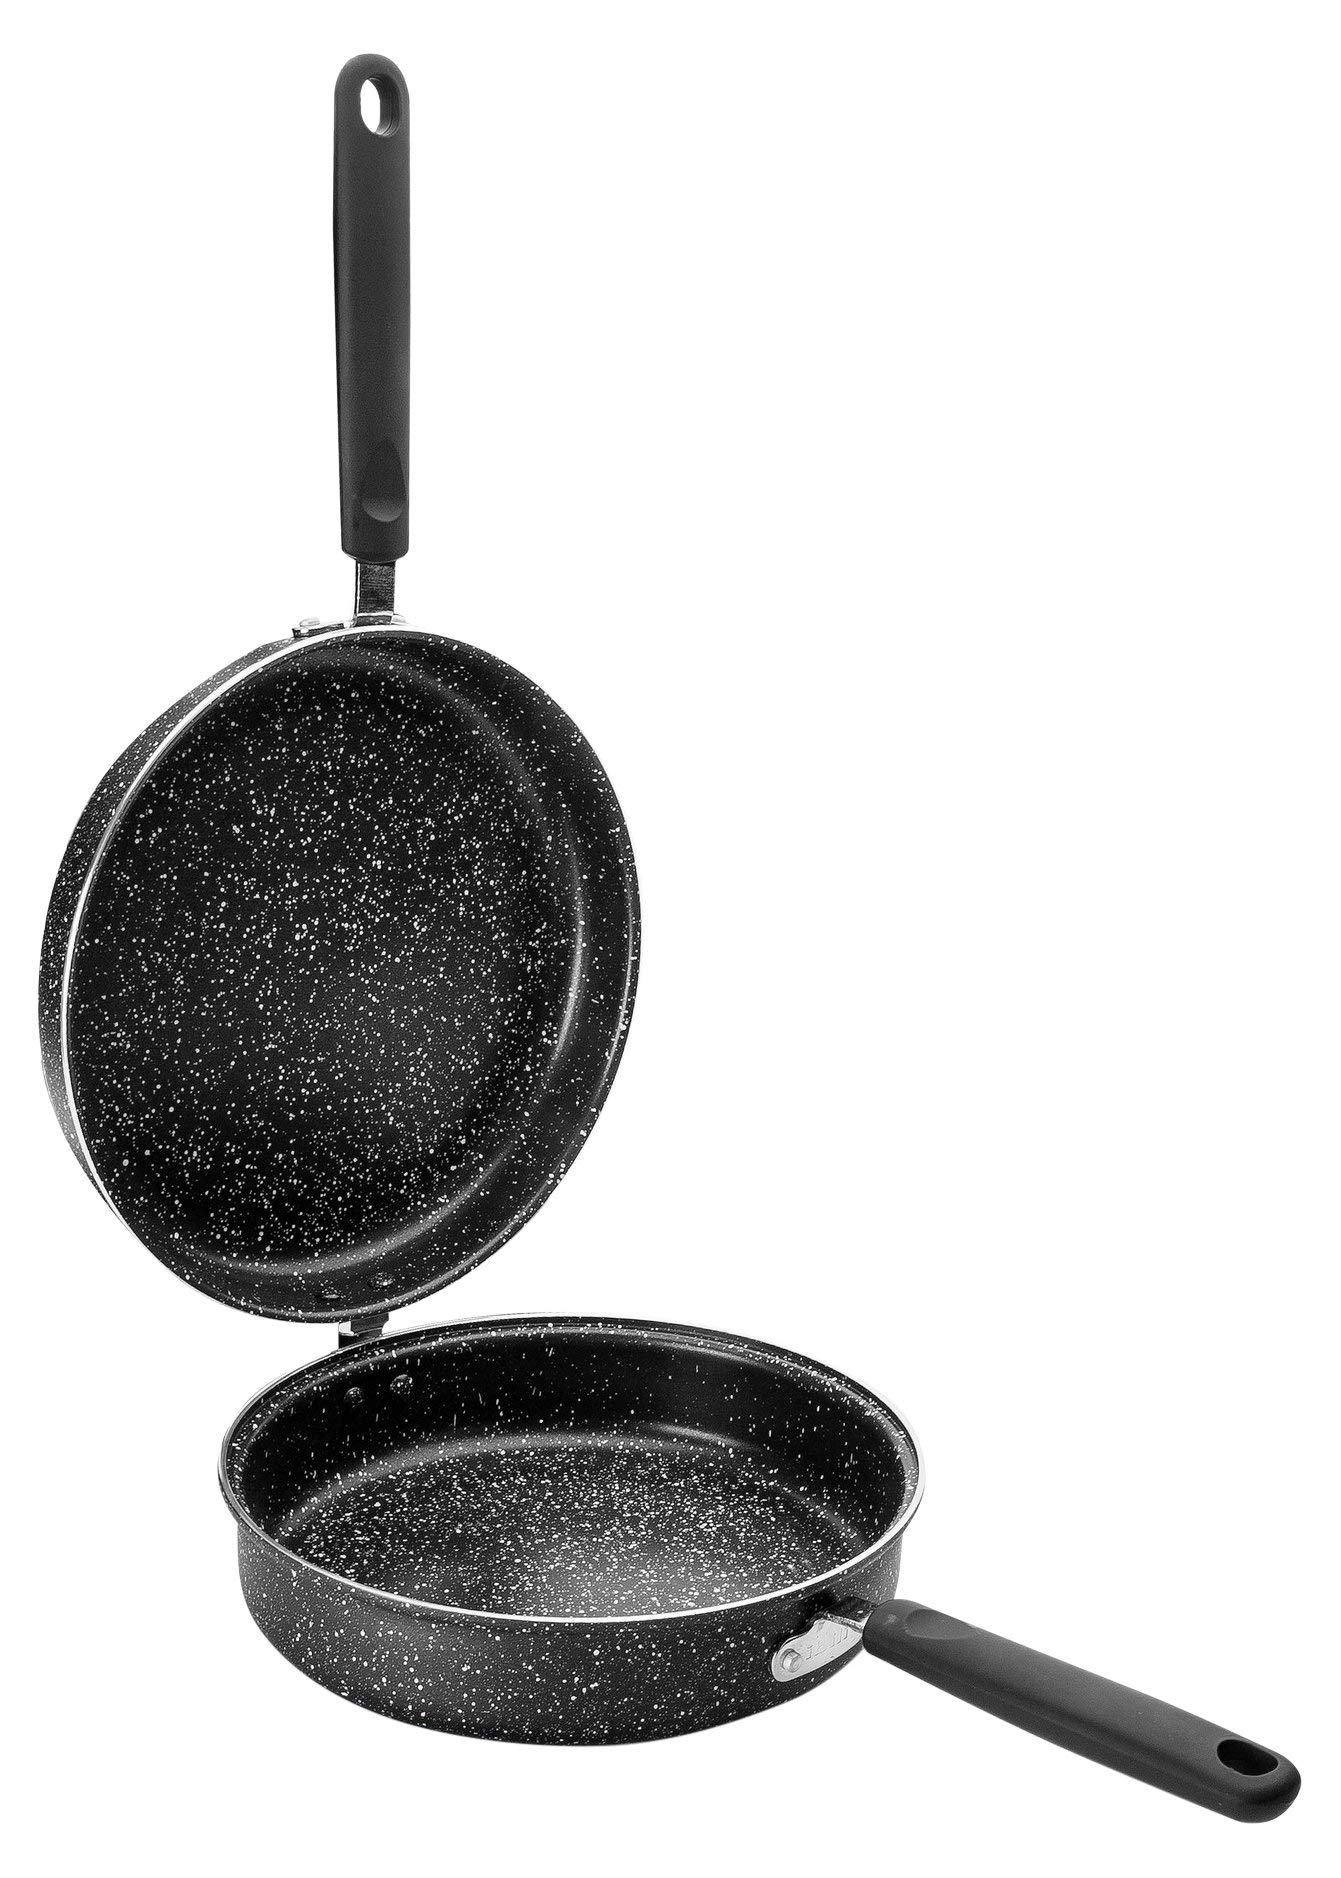 IBILI 441020 sartén para Tortilla Natura Aluminio Negro 20 cm product image